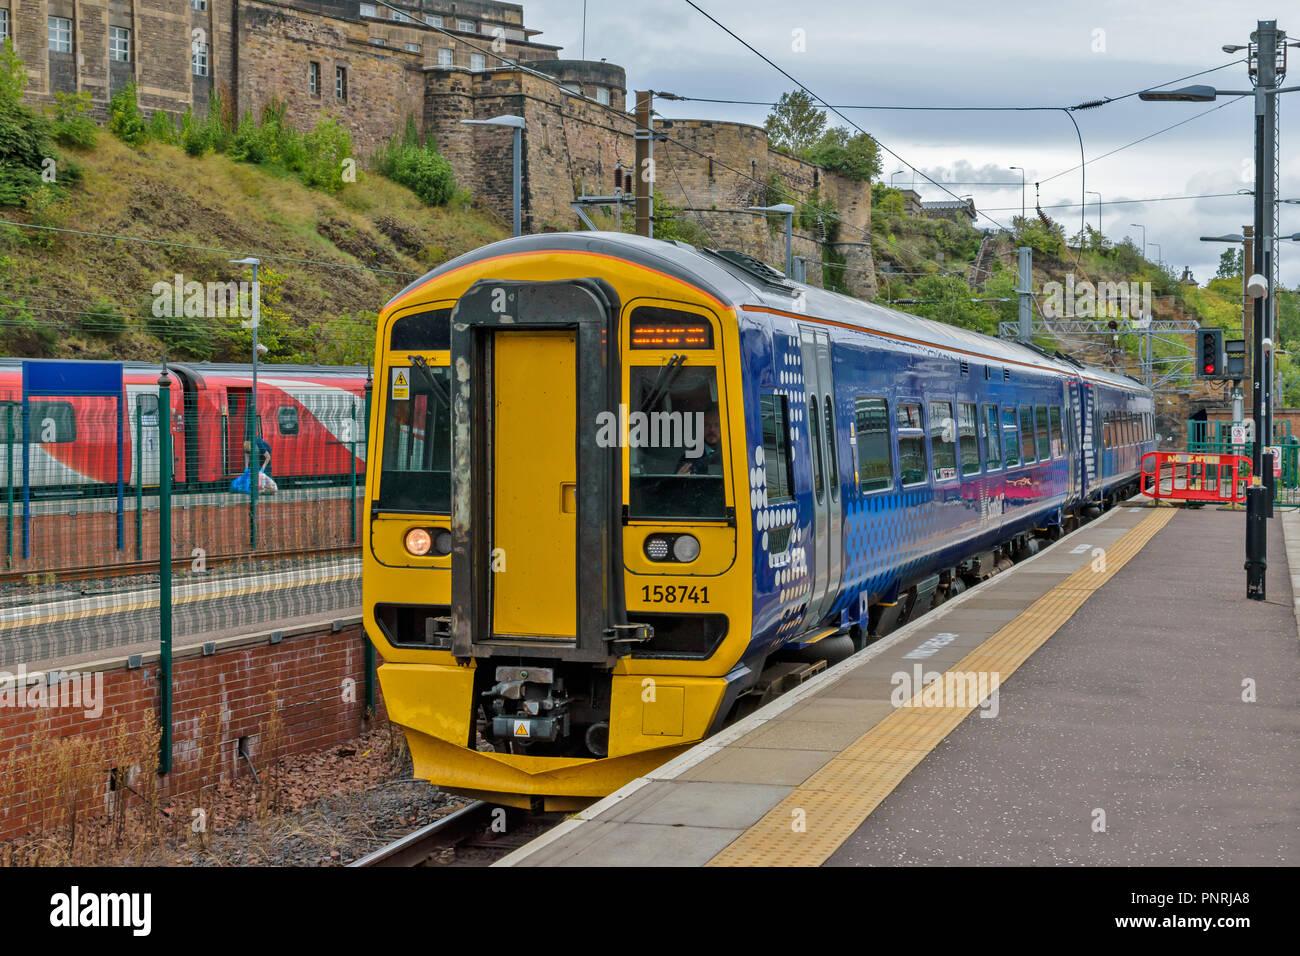 EDINBURGH SCOTLAND WAVERLEY STATION BLUE CARRIAGES OF SCOT RAIL TRAIN ARRIVING AT PLATFORM - Stock Image